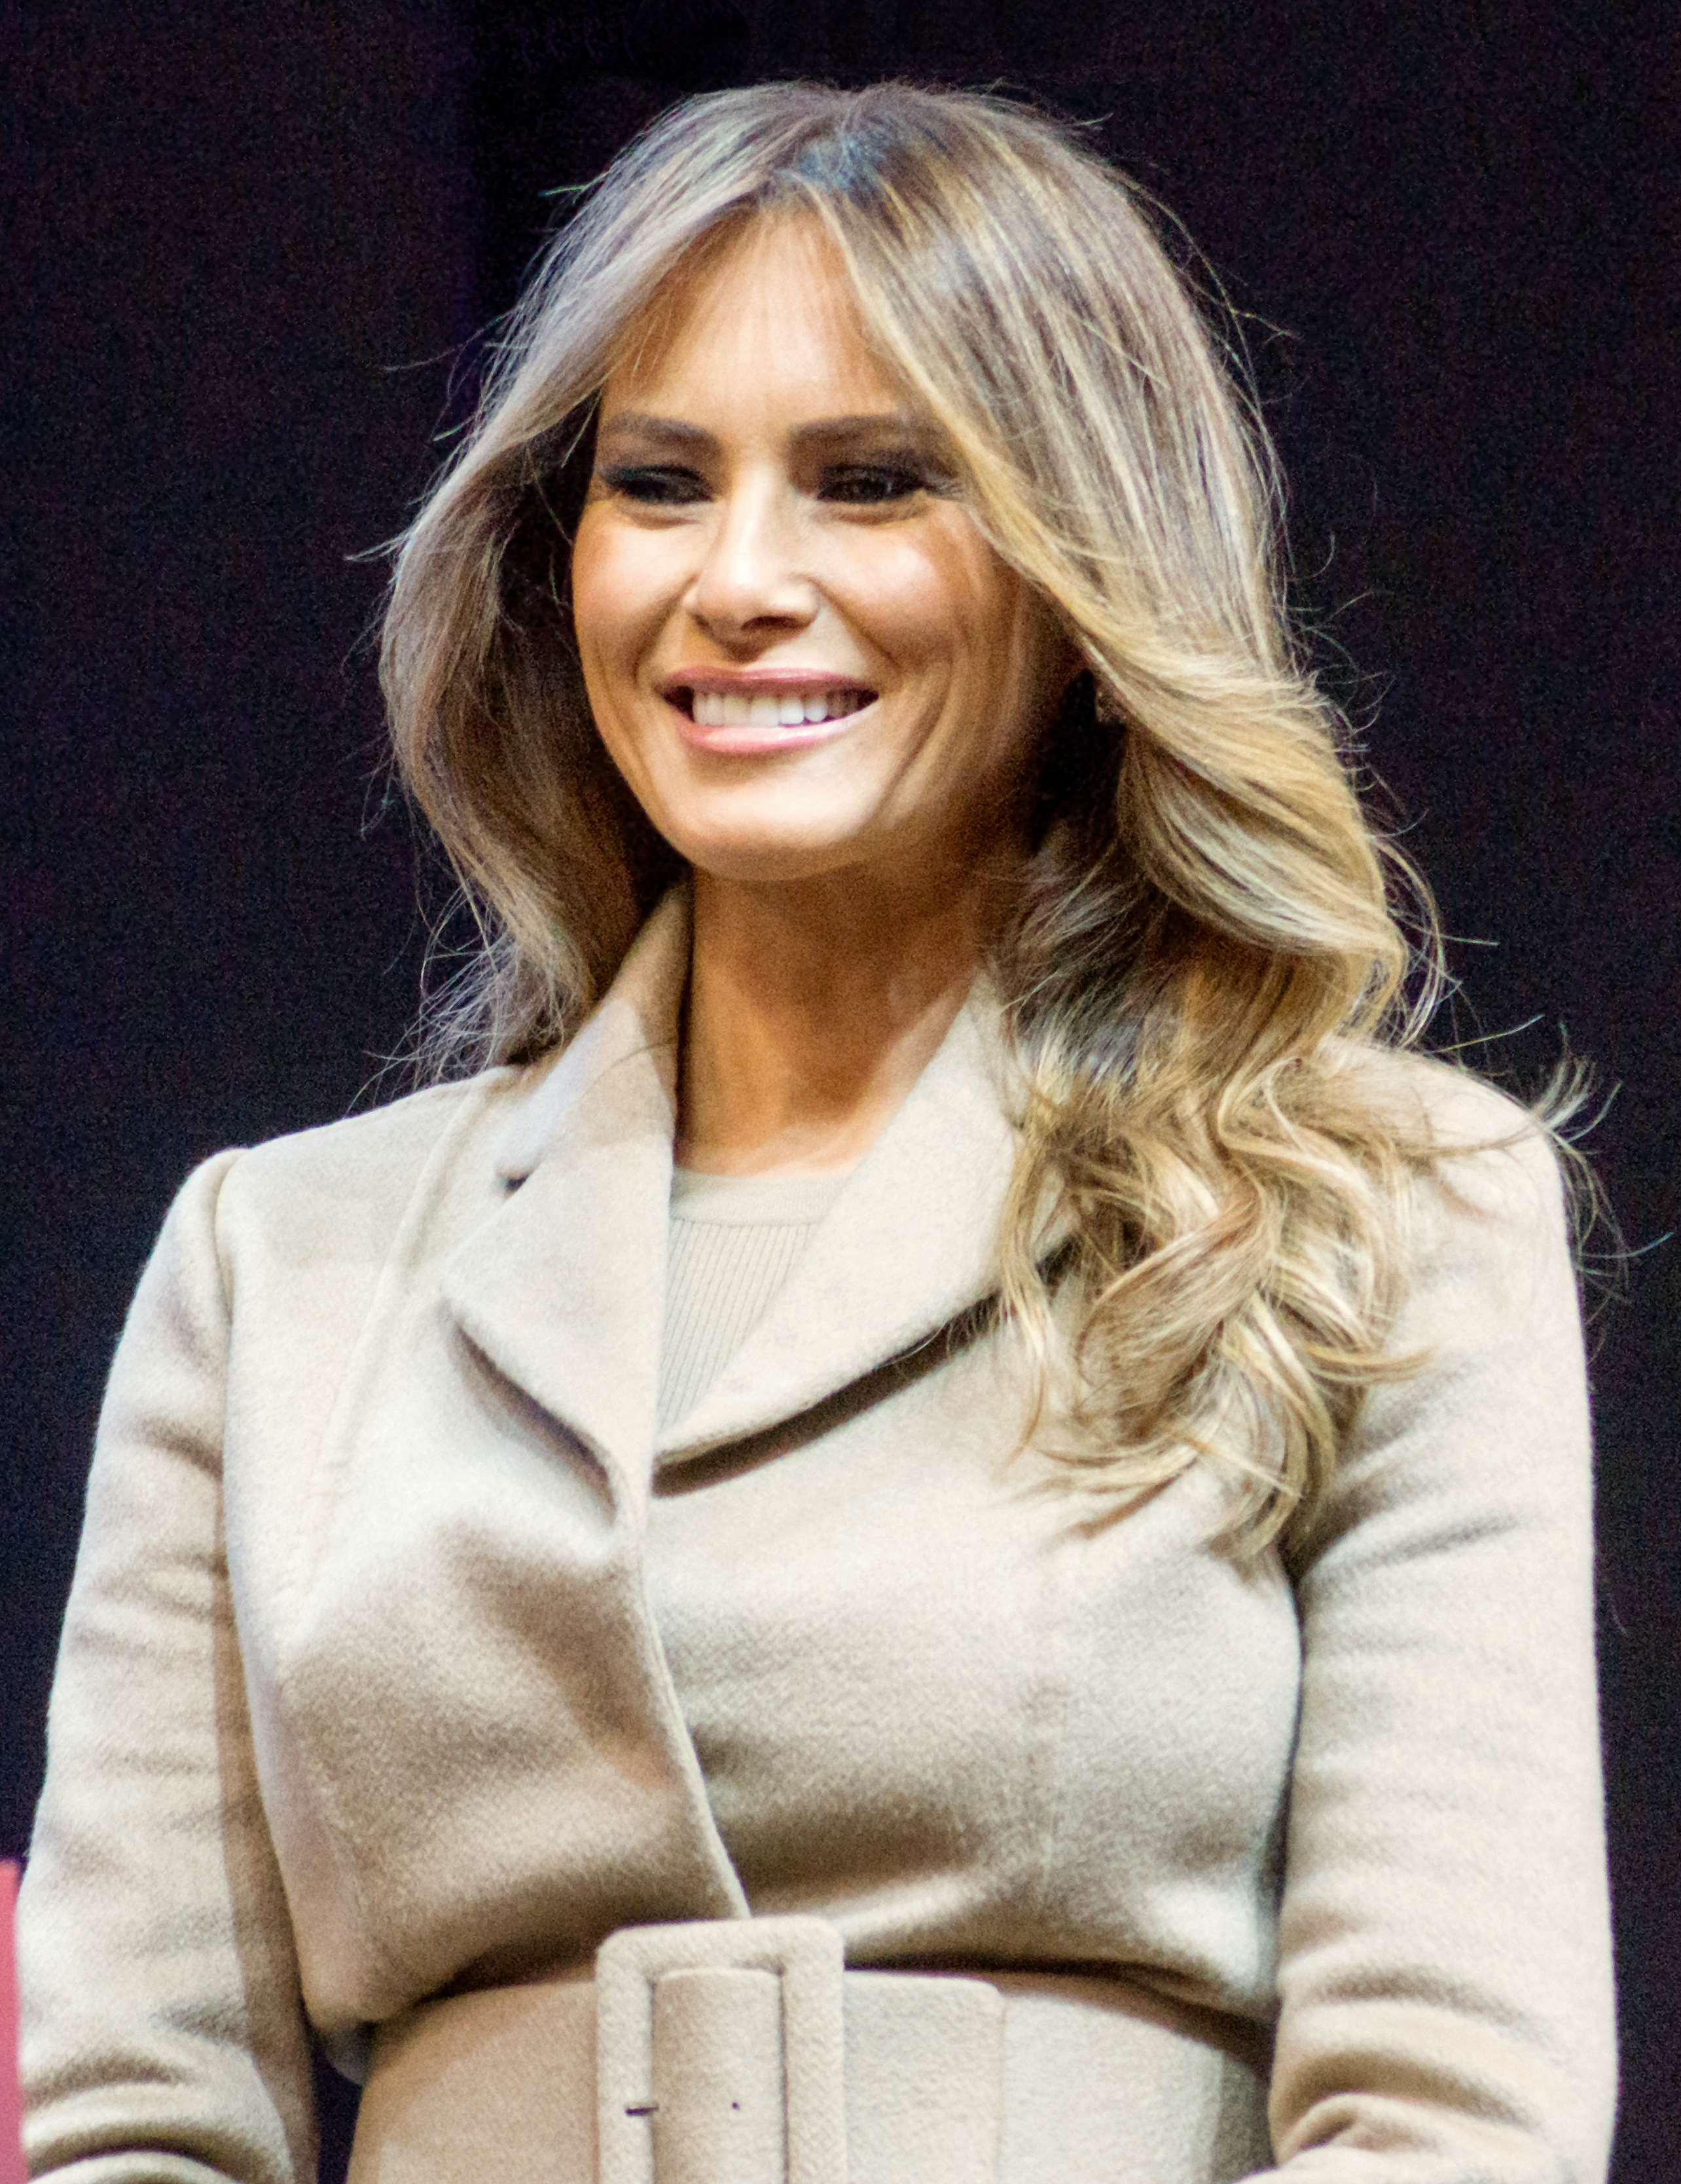 Melania Trump. aus Wikipedia ...